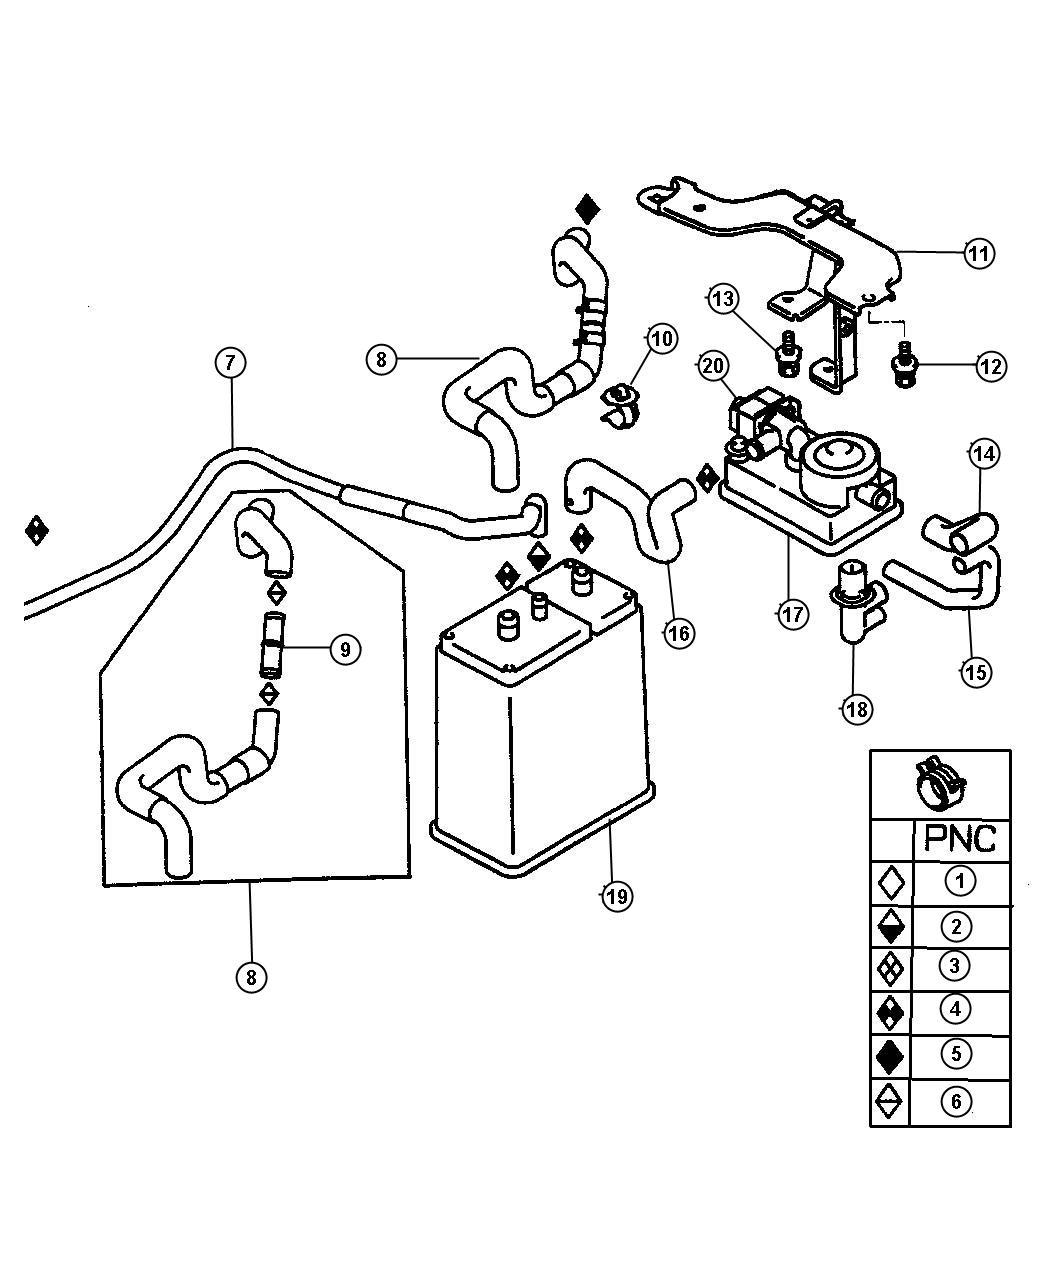 Chrysler Sebring Valve. Fuel vapor control check. [lx